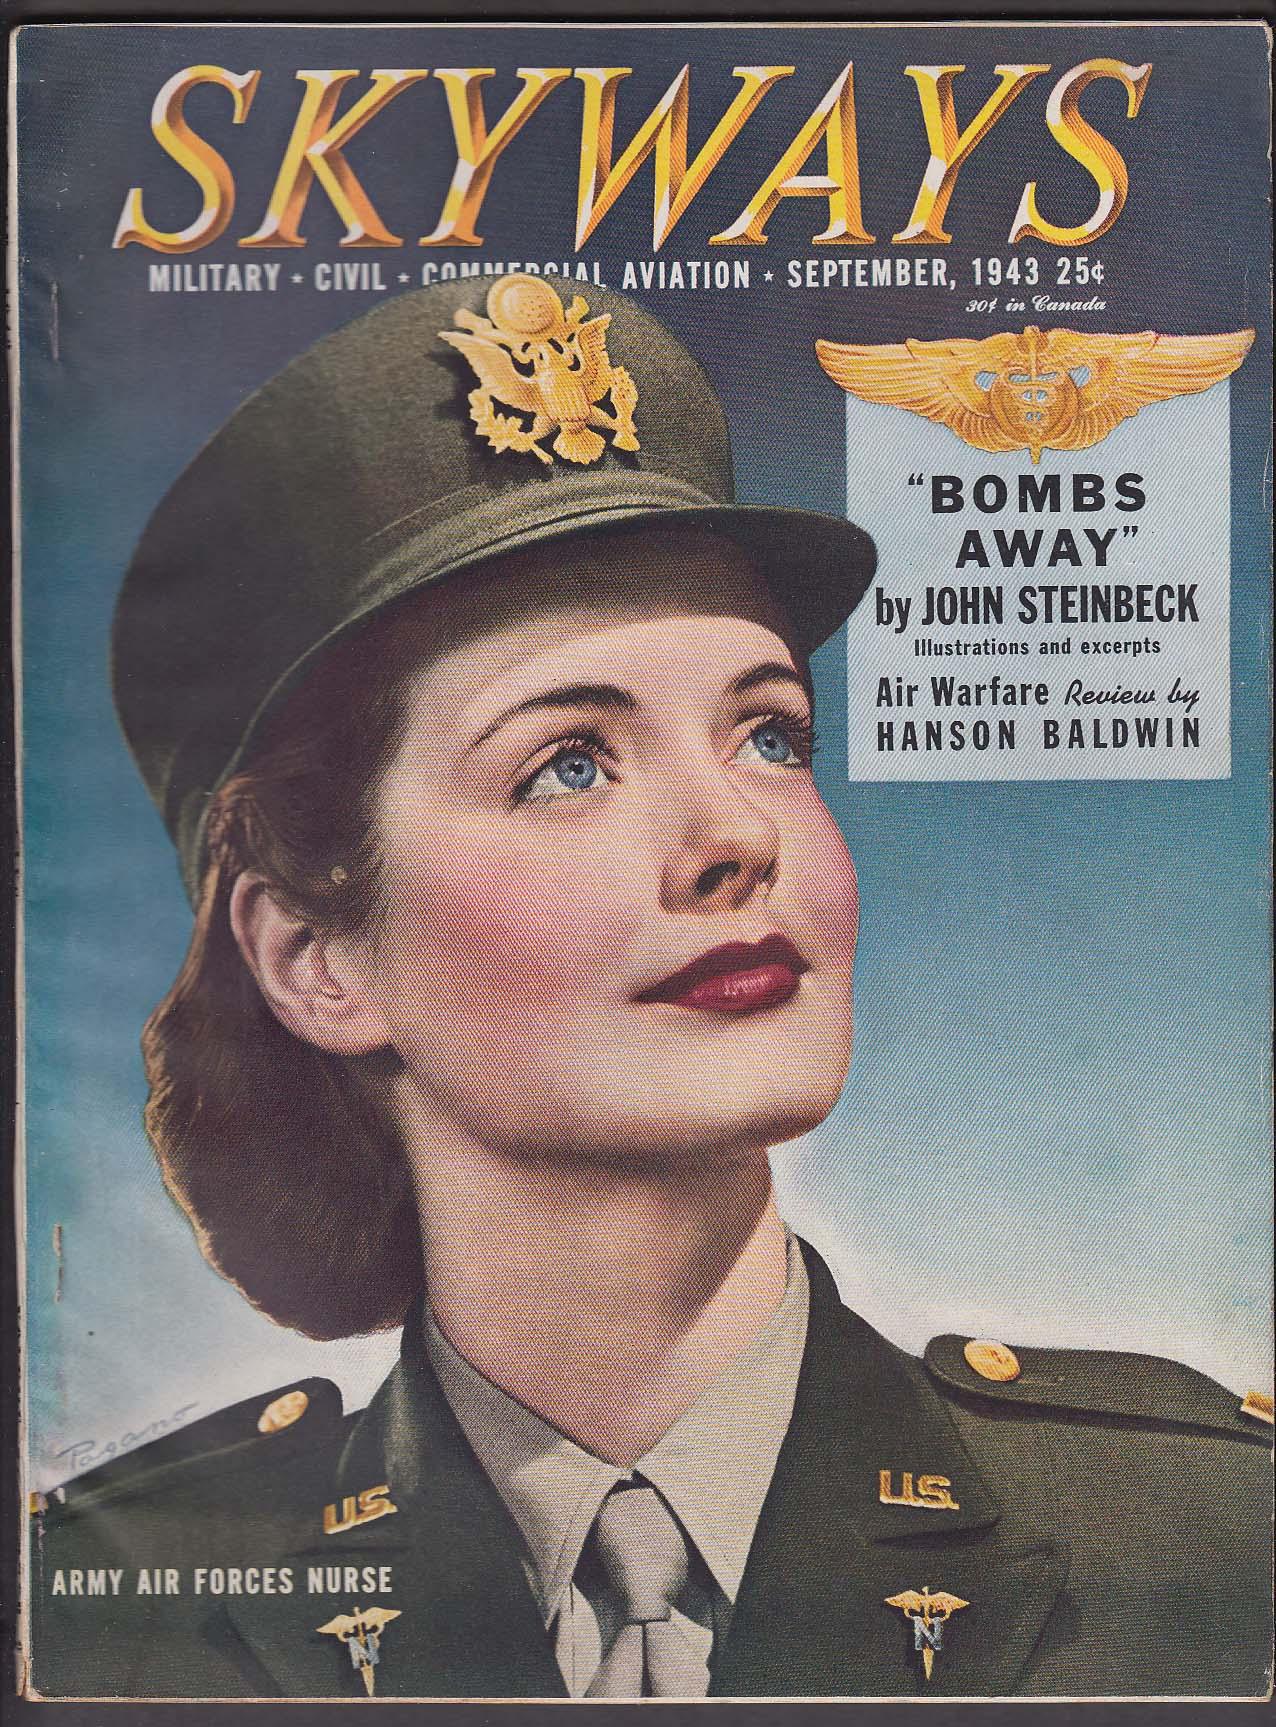 Image for SKYWAYS Army Air Forces Nurse John Steinbeck Hanson Baldwin ++ 9 1943